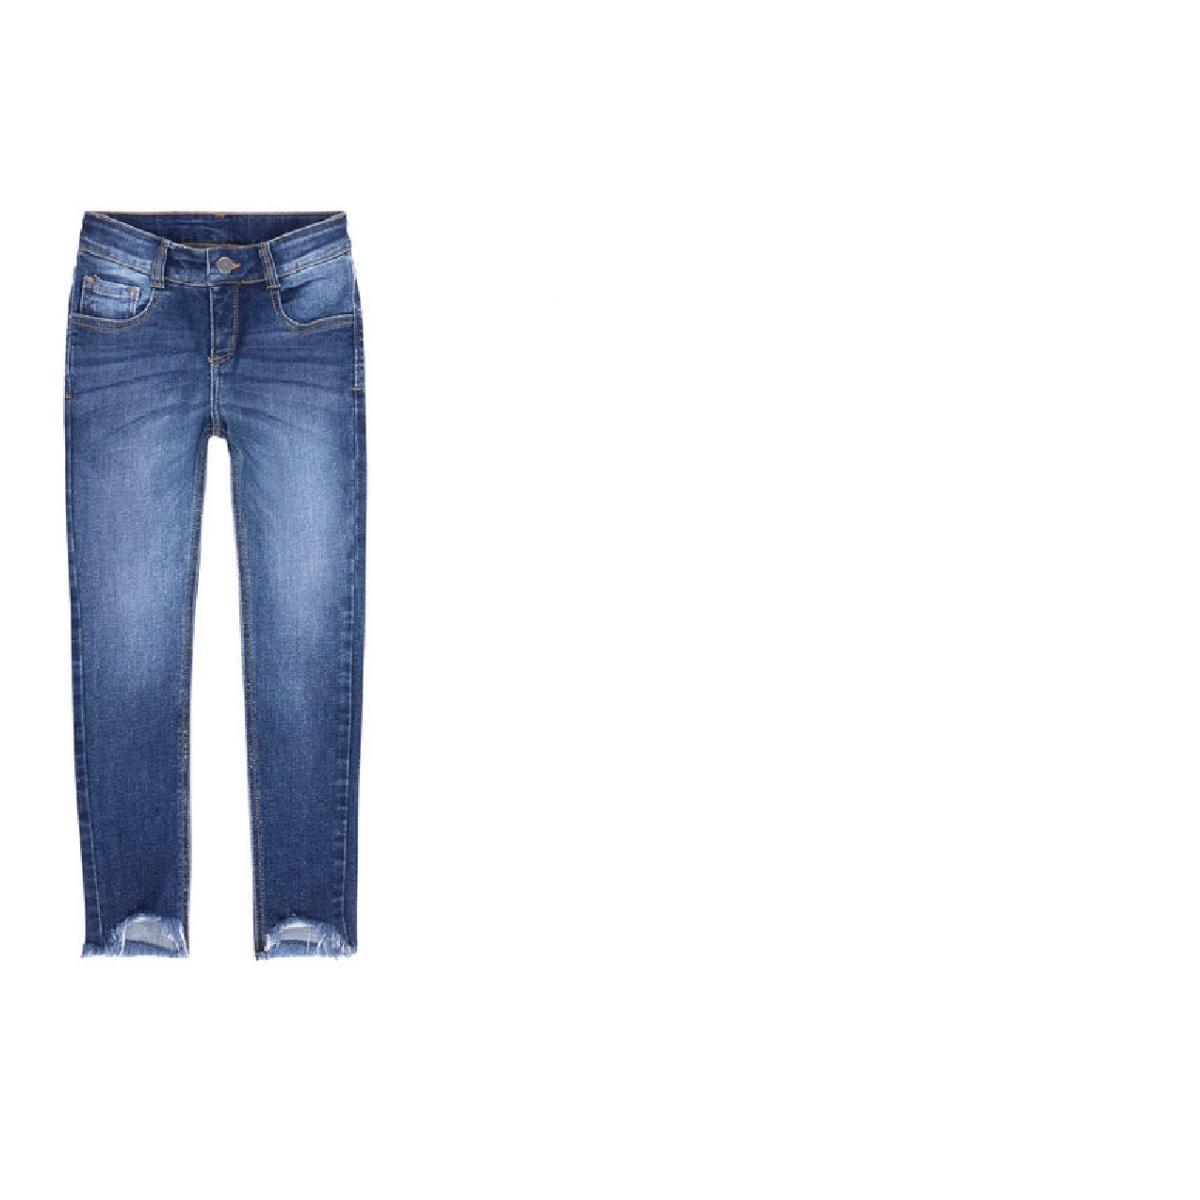 Calça Fem Infantil Puc Ubld 1aej Jeans